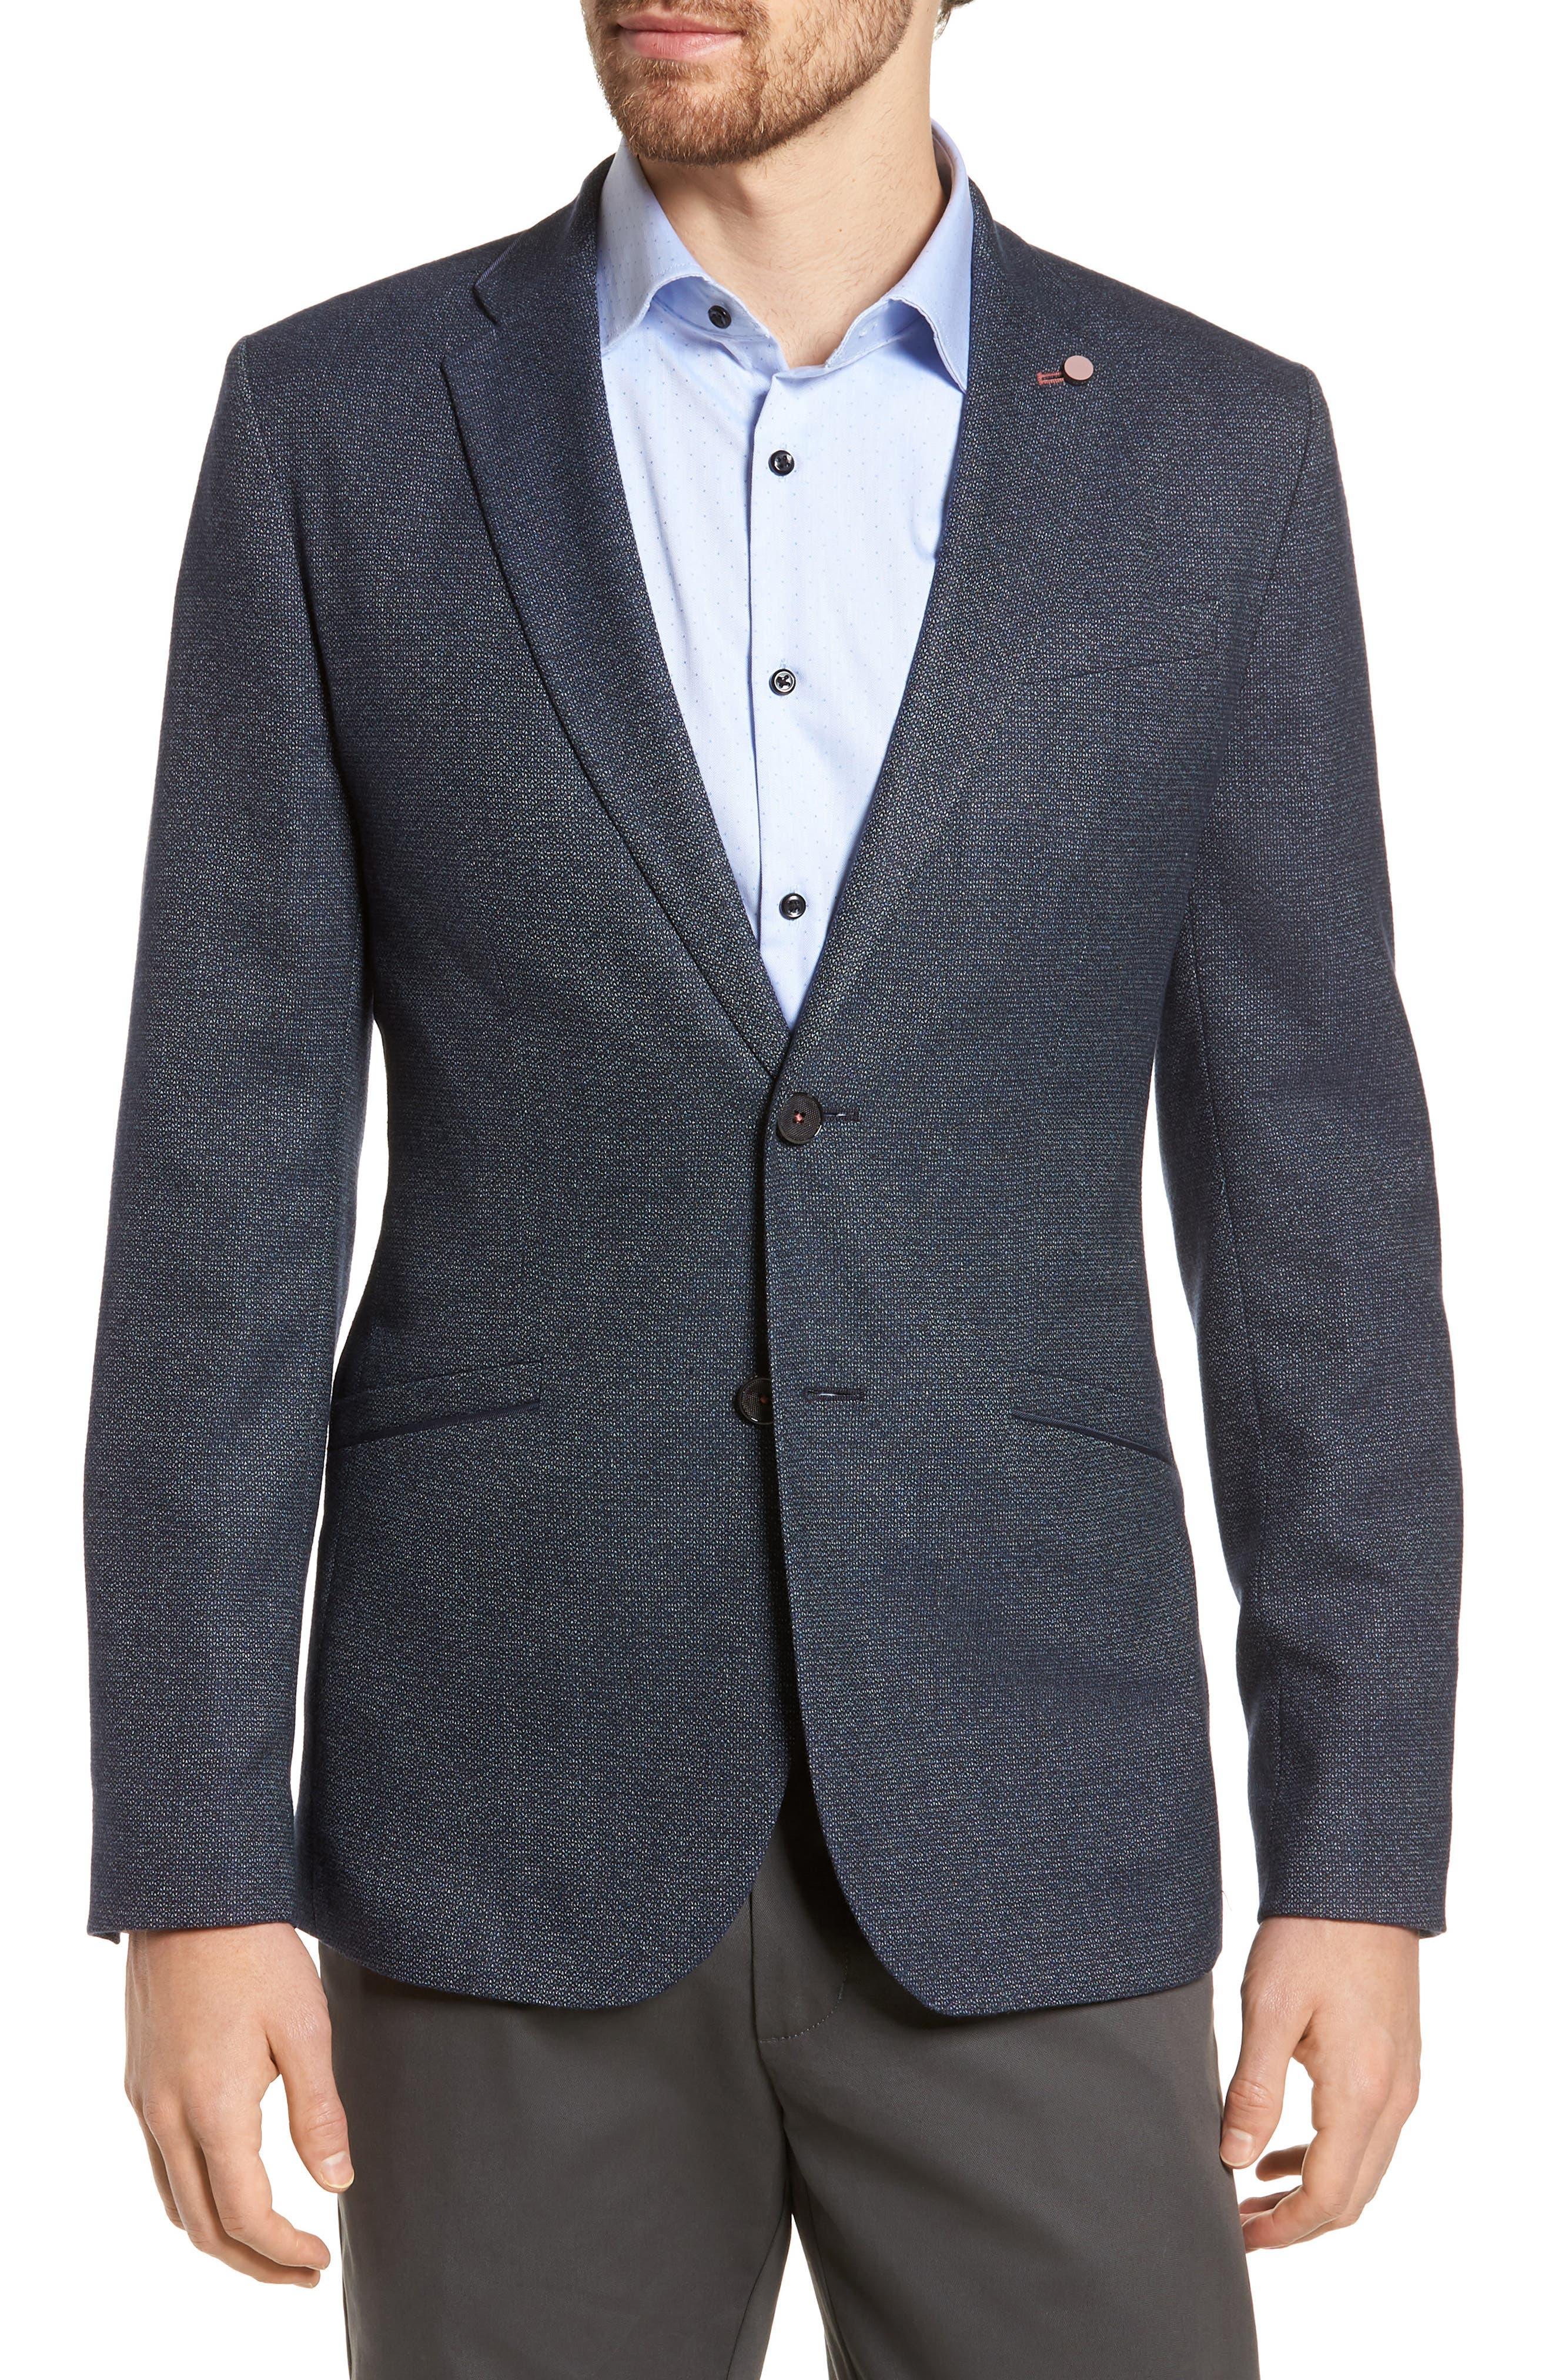 Main Image - Ted Baker London Burke Semi Plain Trim Fit Jacket